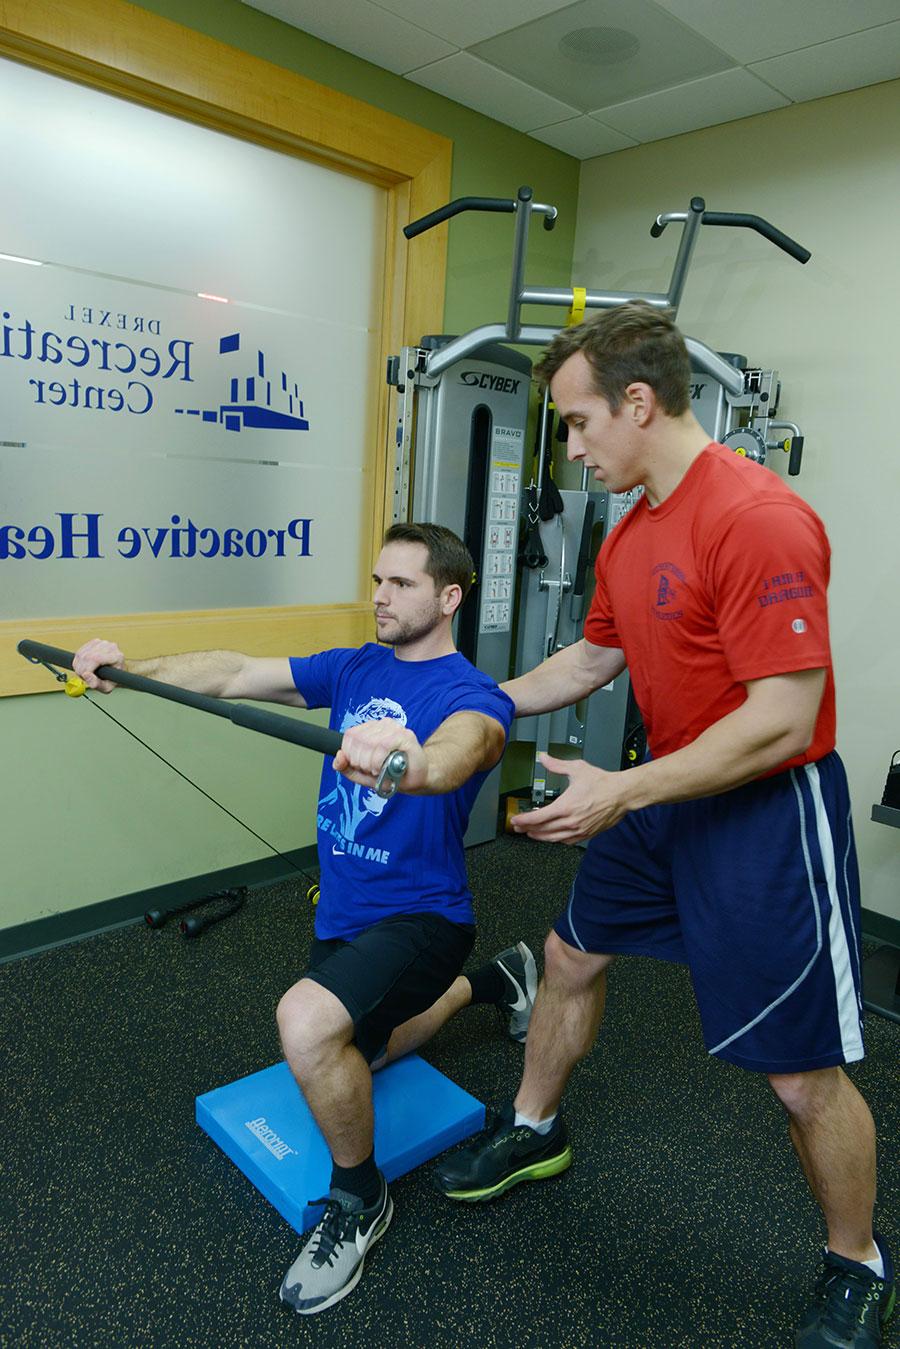 Personal Training | Recreation Center | Drexel University